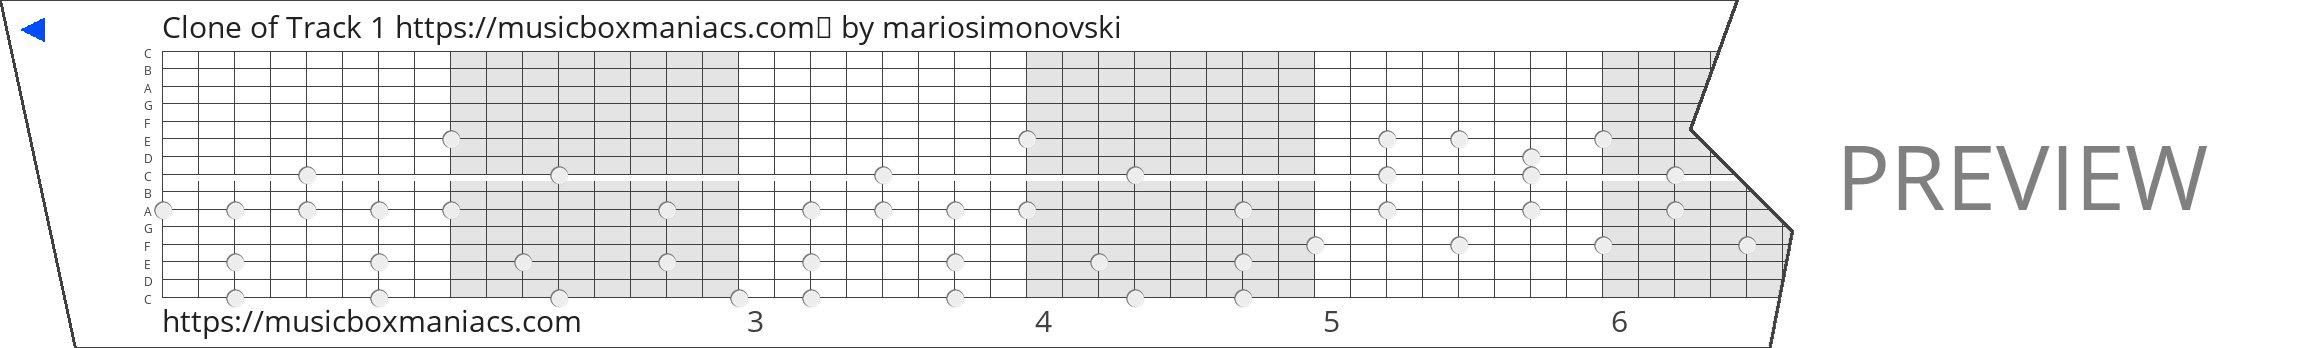 Clone of Track 1 https://musicboxmaniacs.com 15 note music box paper strip